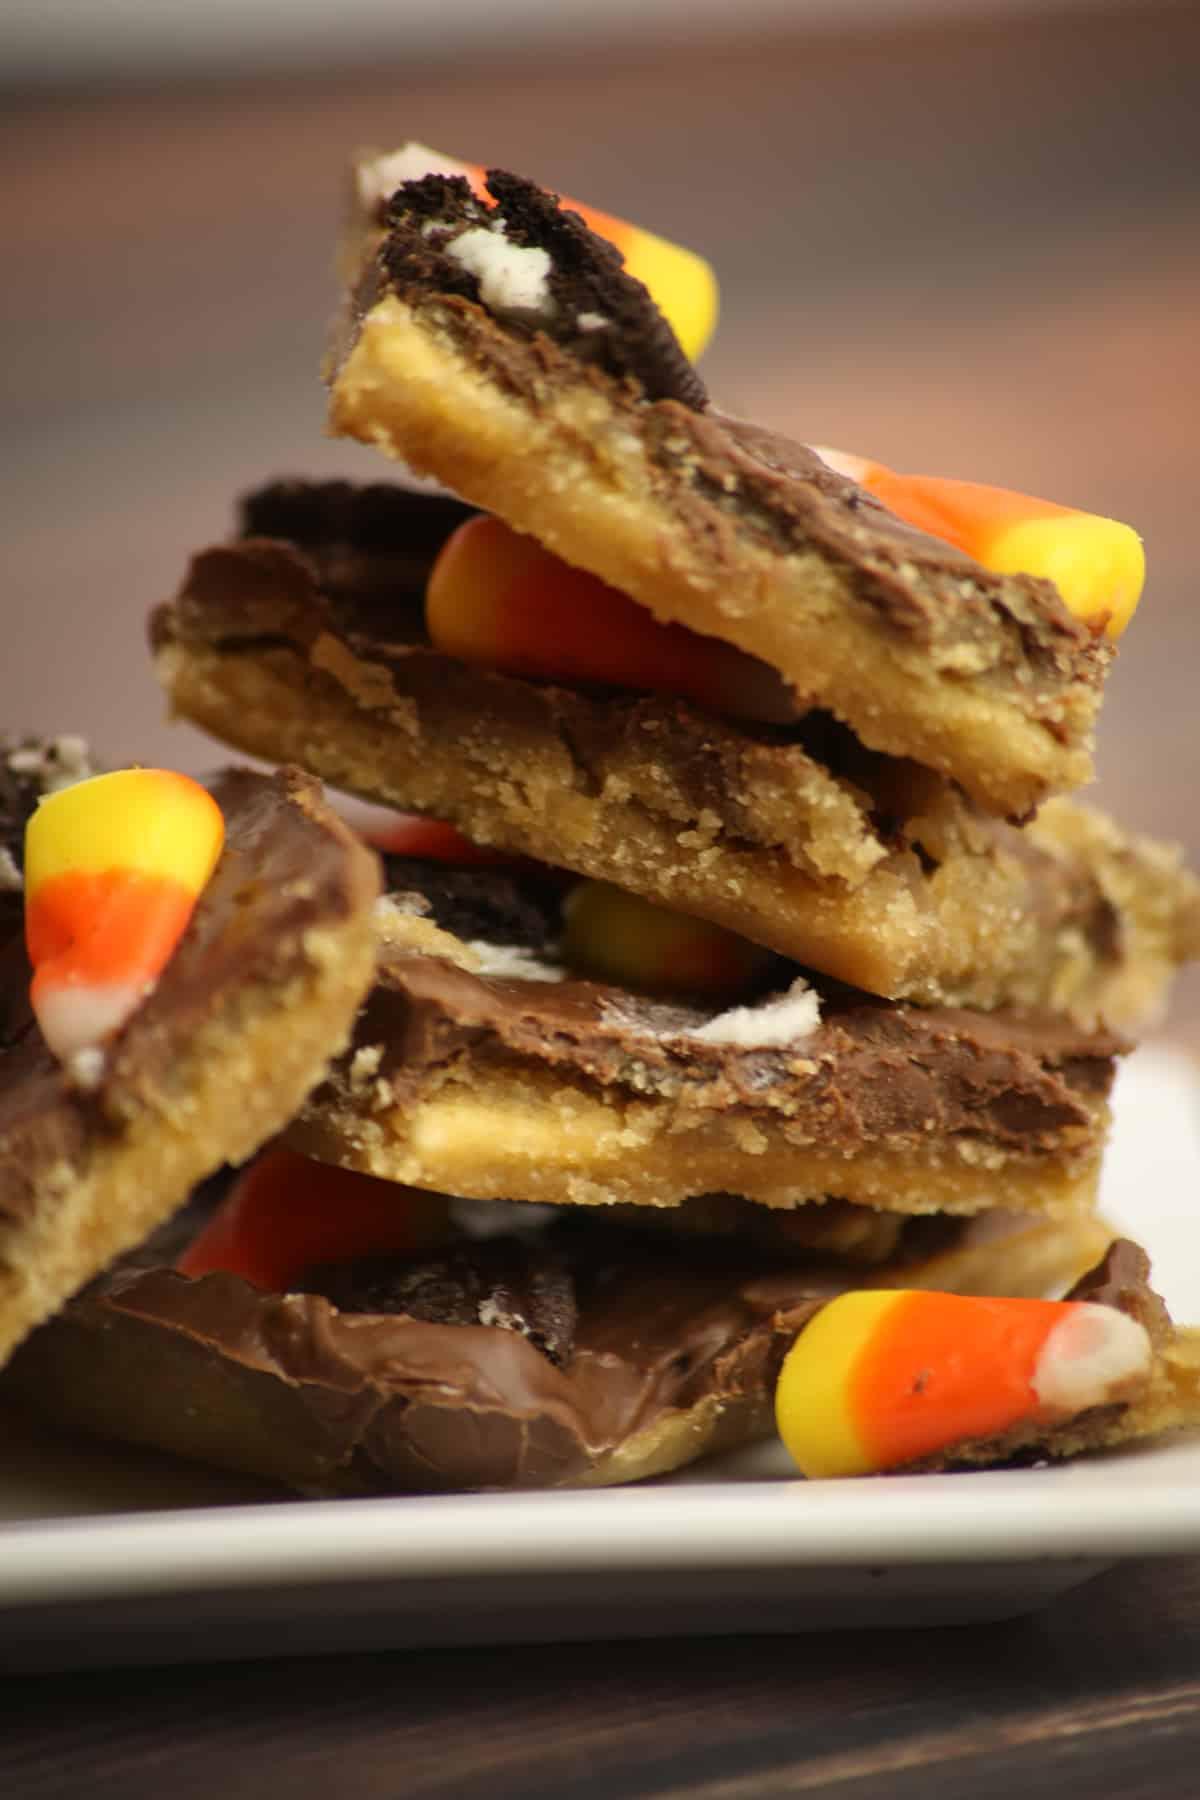 Oreo Candy Corn Saltine Cracker Toffee